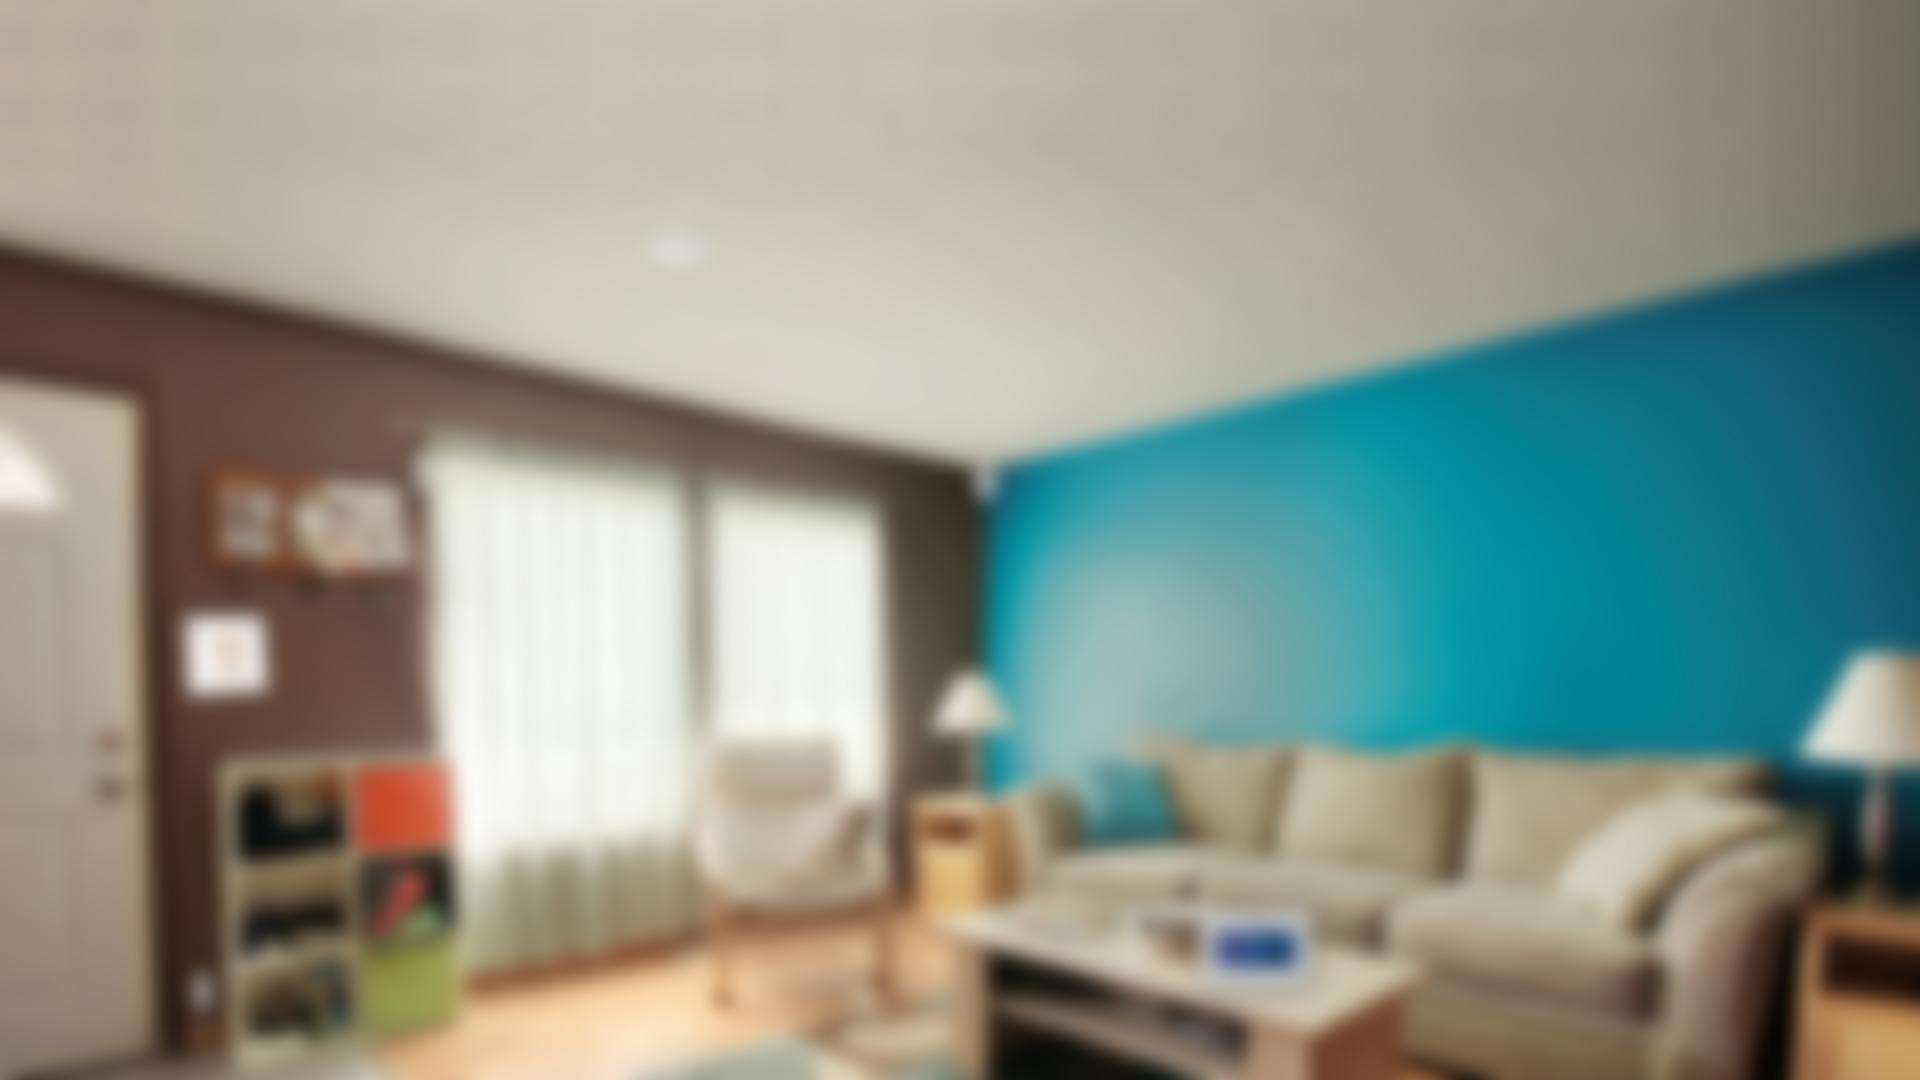 Visonic-home-page-blur-bg-final